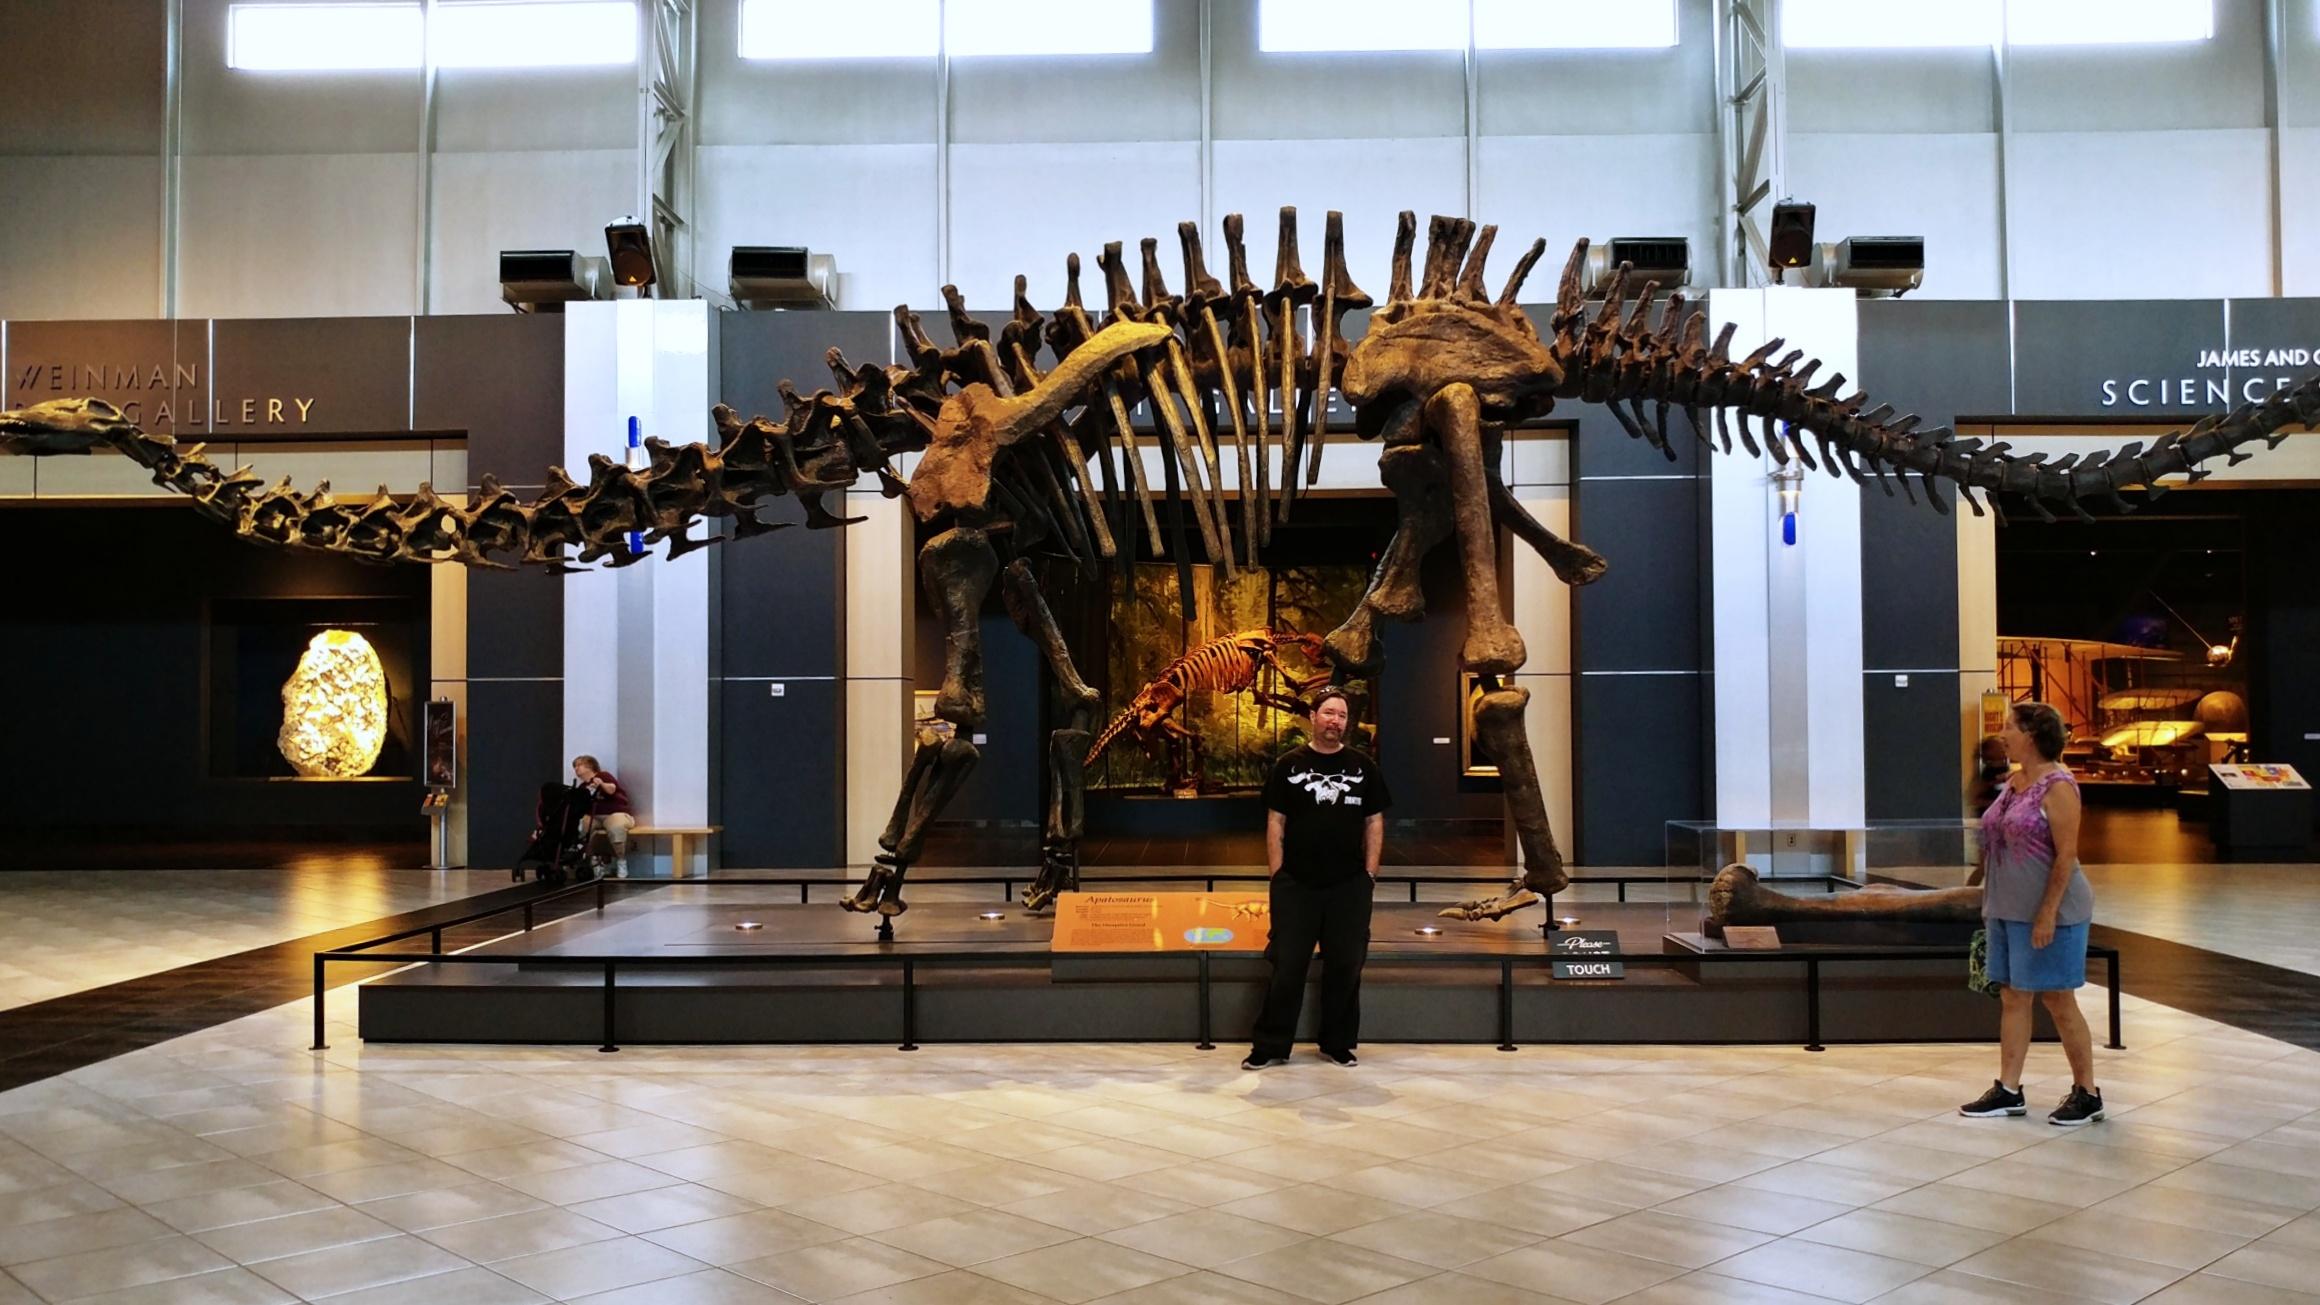 tellus science museum lobby apatasaurus jul 2019 (4).jpg